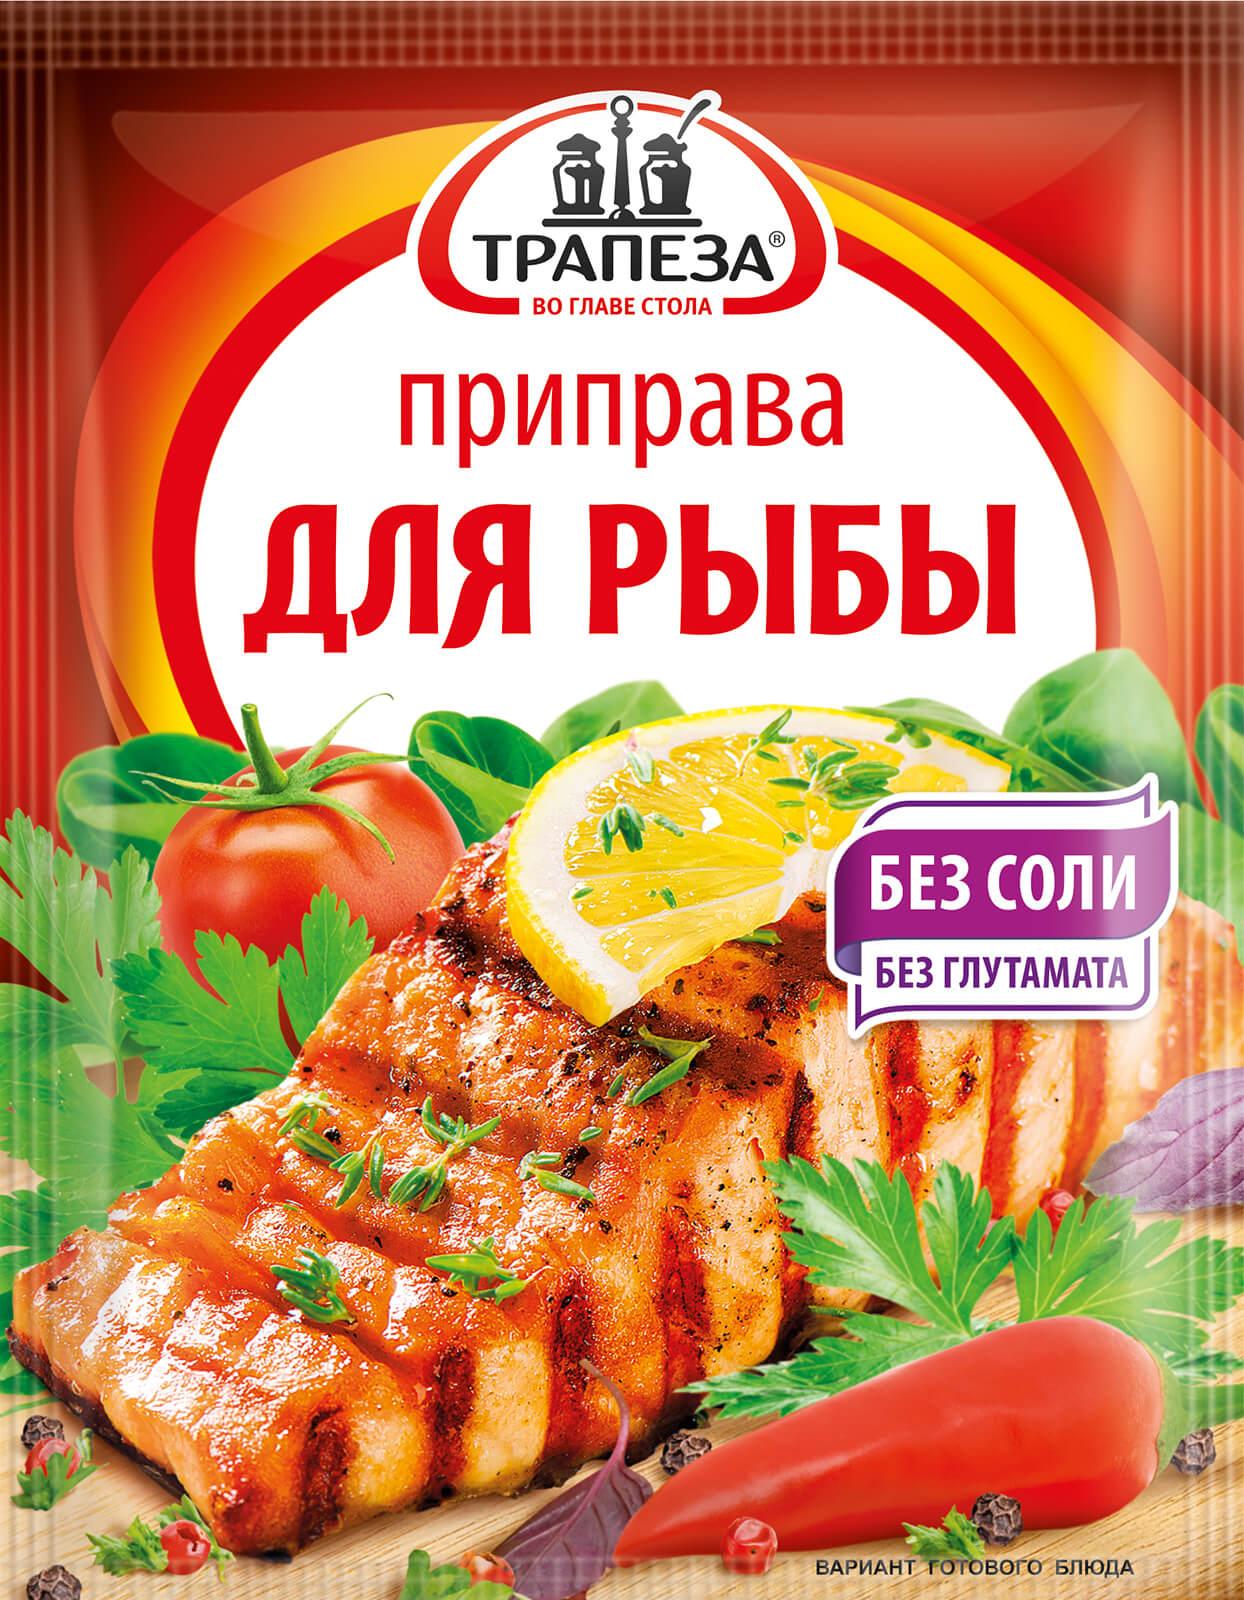 Приправа для рыбы Трапеза 15г.